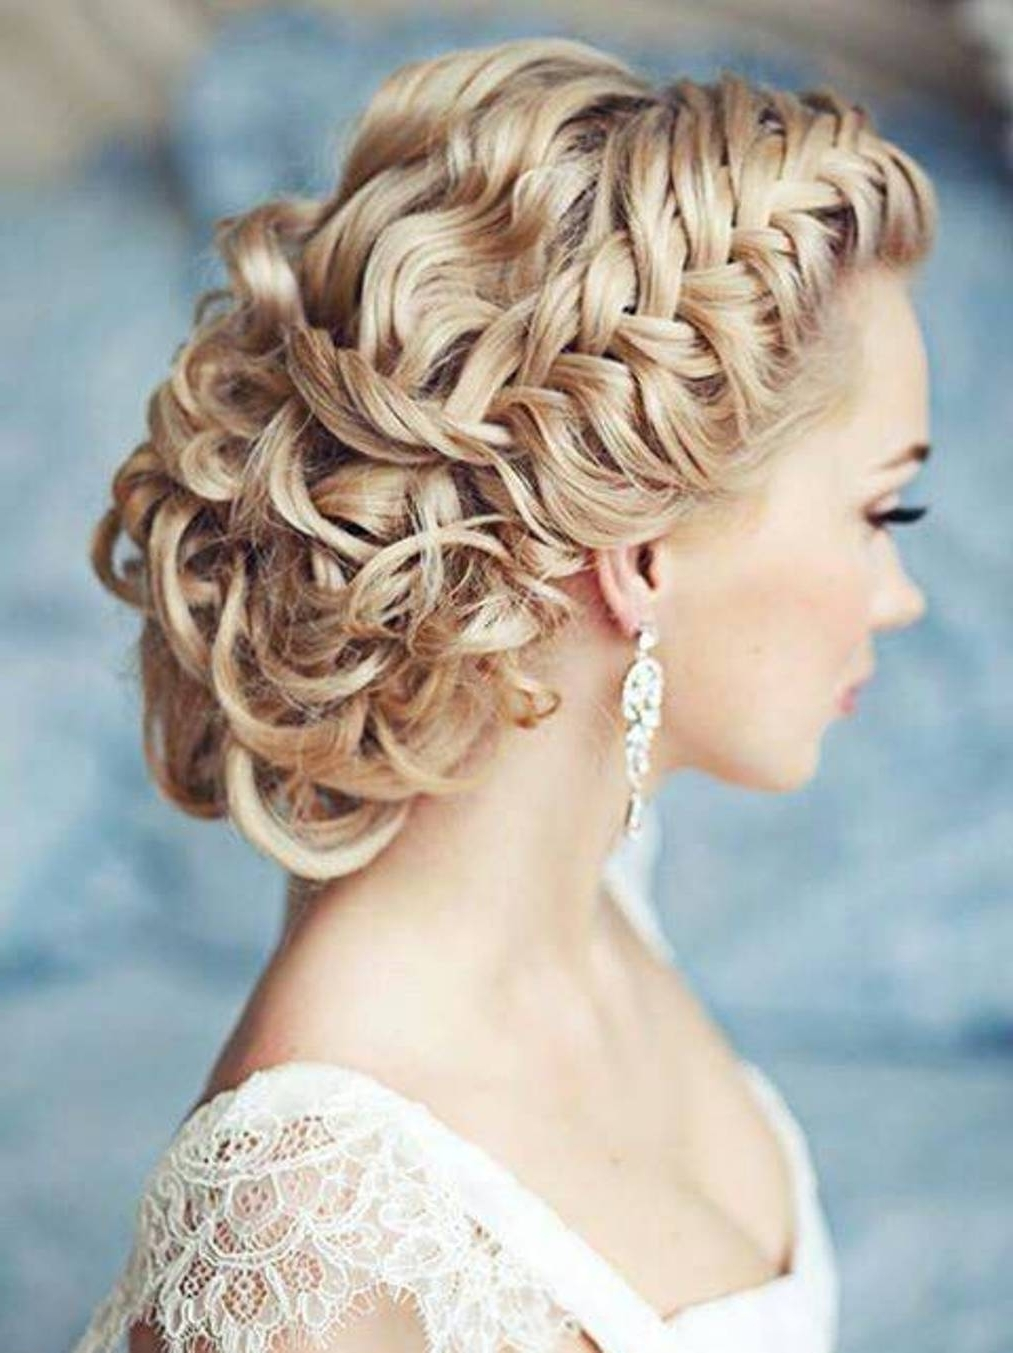 Wedding Hairstyle With Braids Stunning Braided Wedding Hairstyles Intended For Preferred Braided Wedding Hairstyles (View 14 of 15)